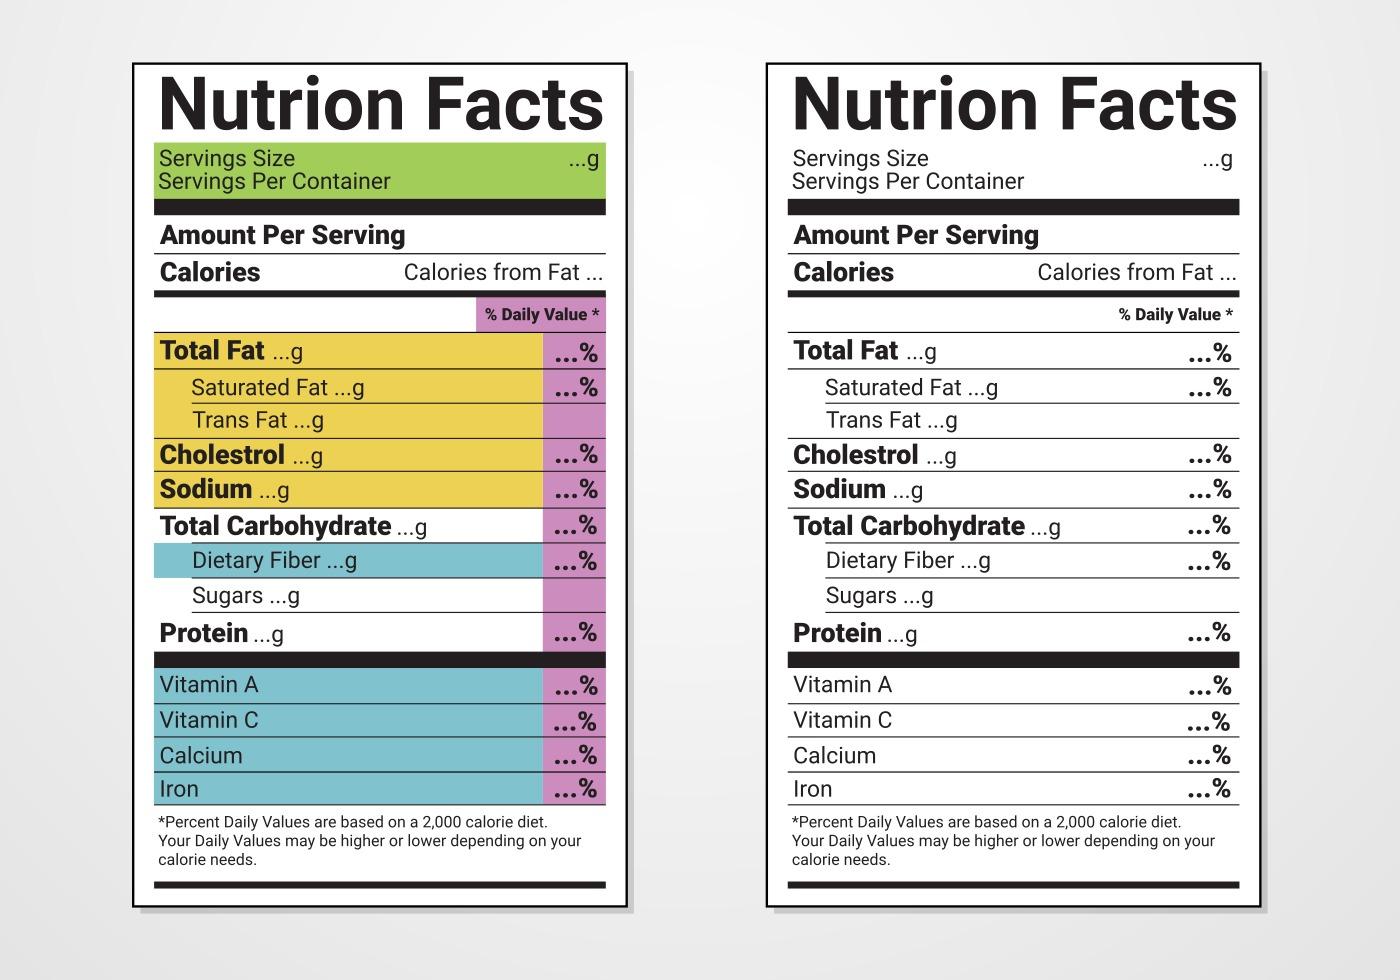 Vector De La Etiqueta De La Etiqueta De La Nutricion